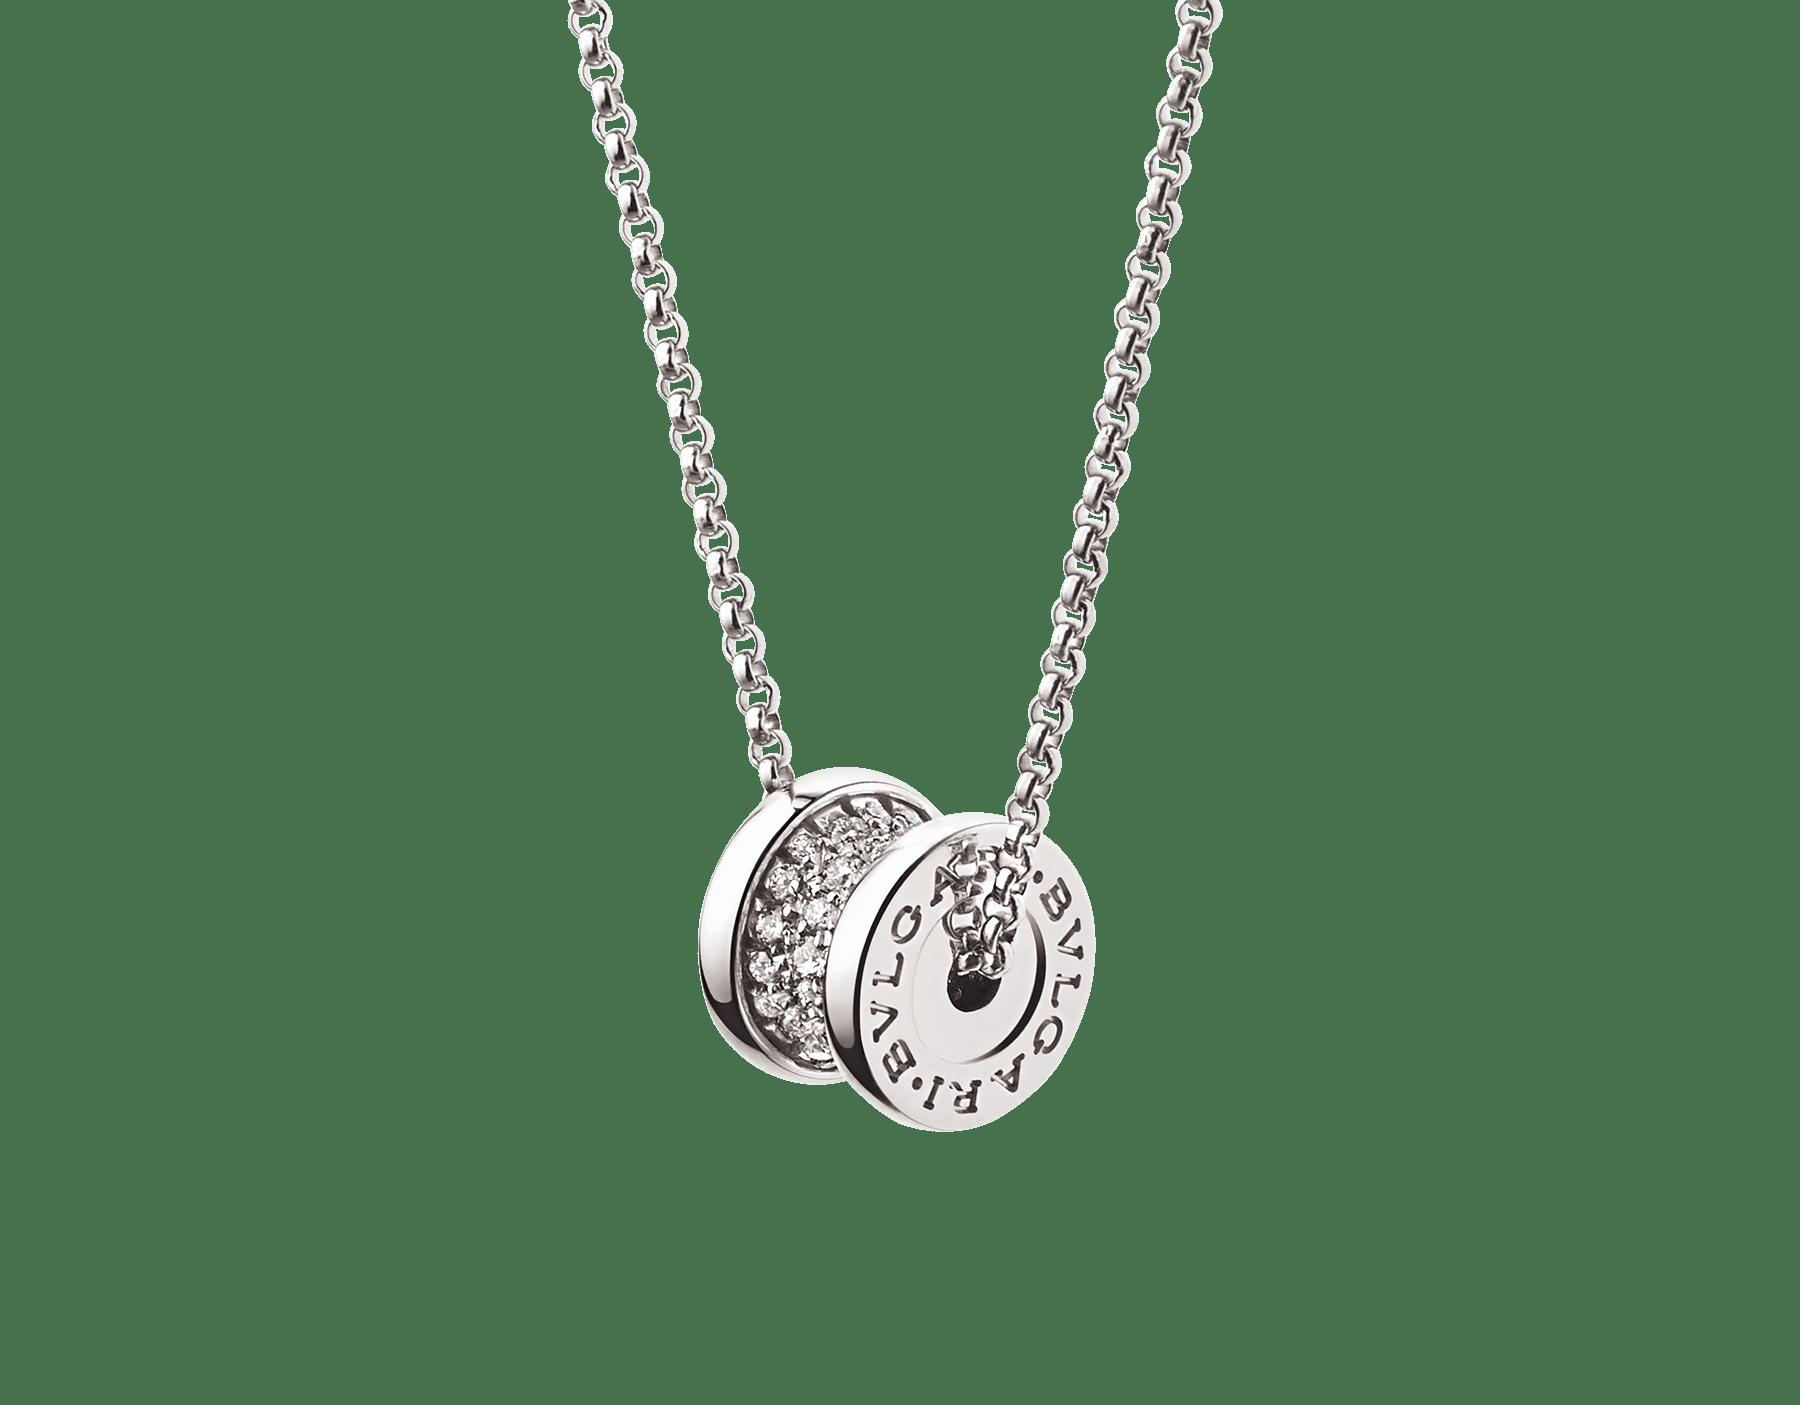 B.zero1 18K 白金項鍊,18K 白金圓形項墜,螺旋飾以密鑲鑽石。 351117 image 1